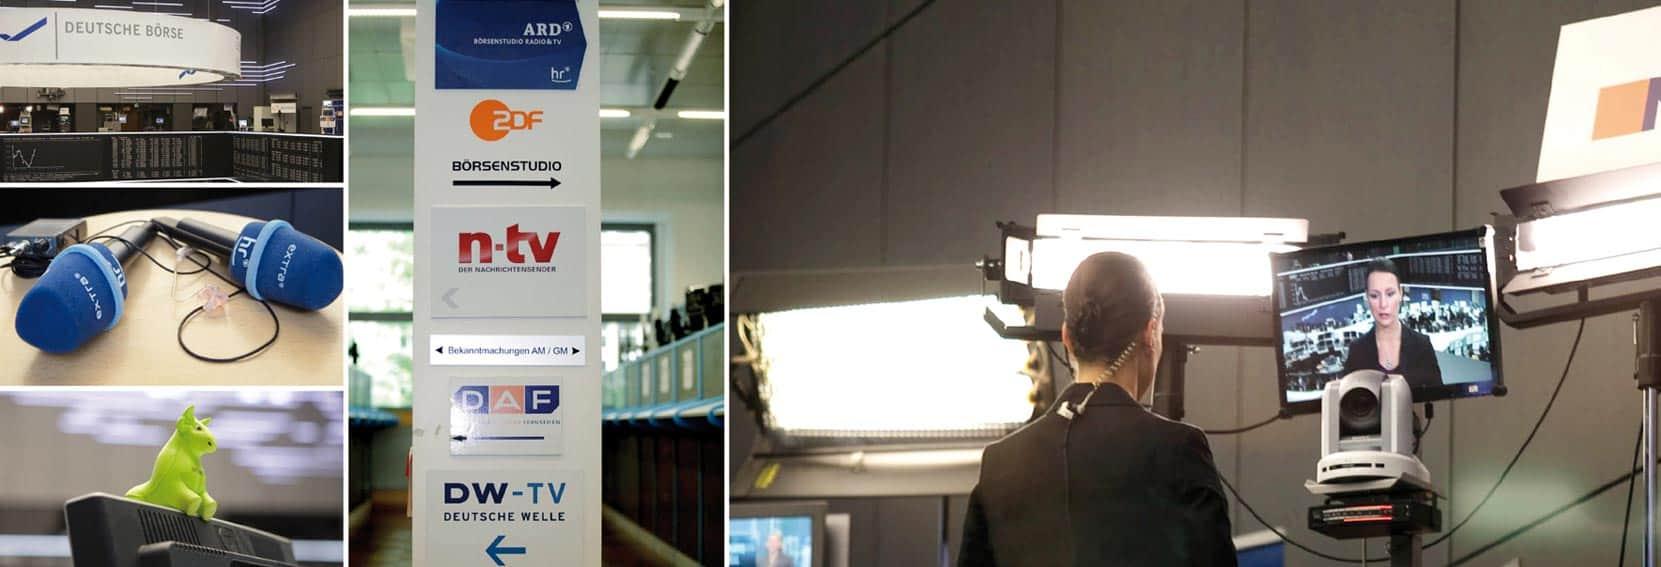 Kommunikationstraining mit der Investor Relations Agentur cometis AG